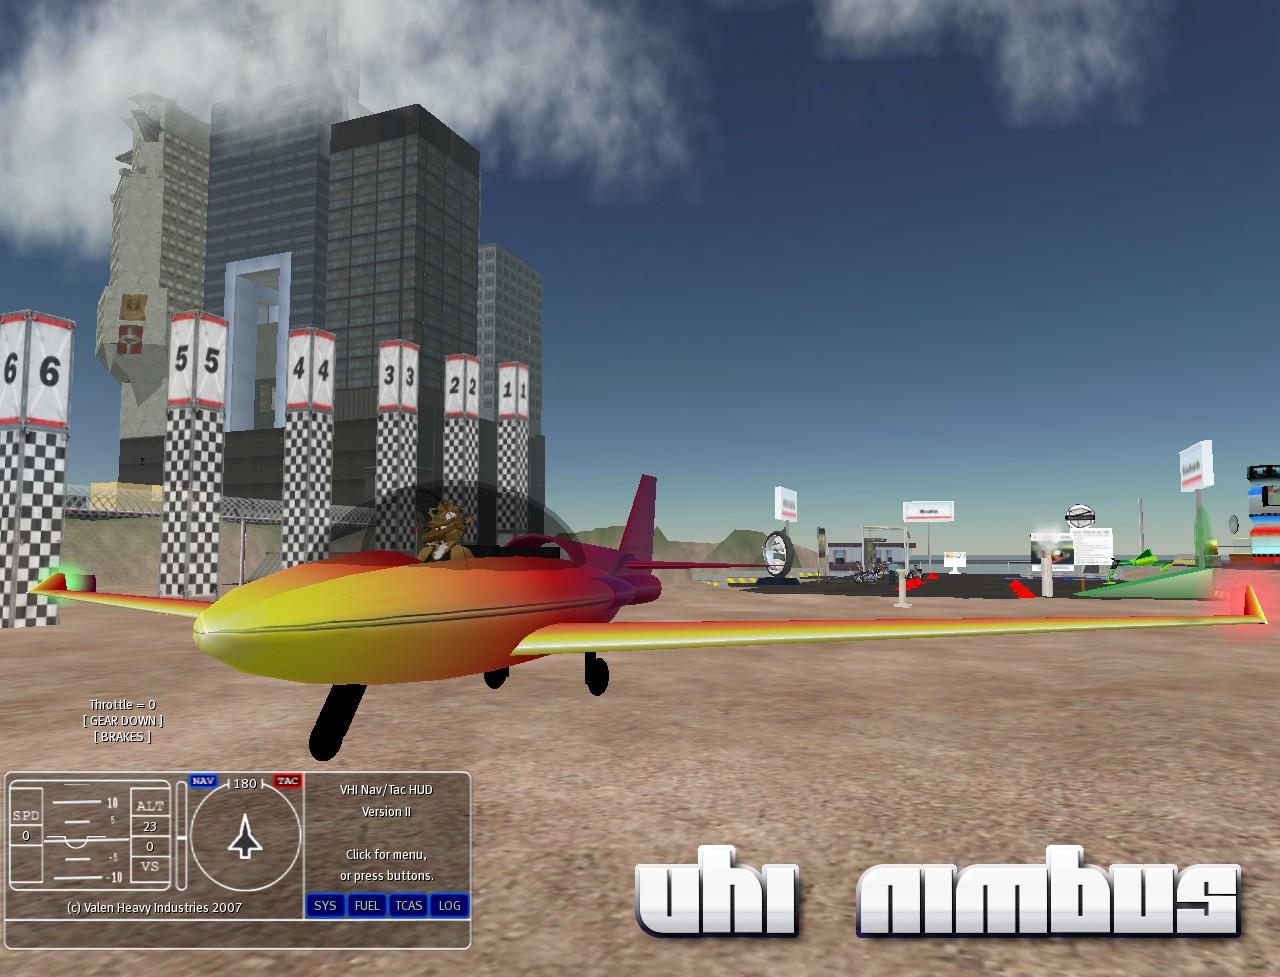 VHI Nimbus aerobatic general aviation jet.